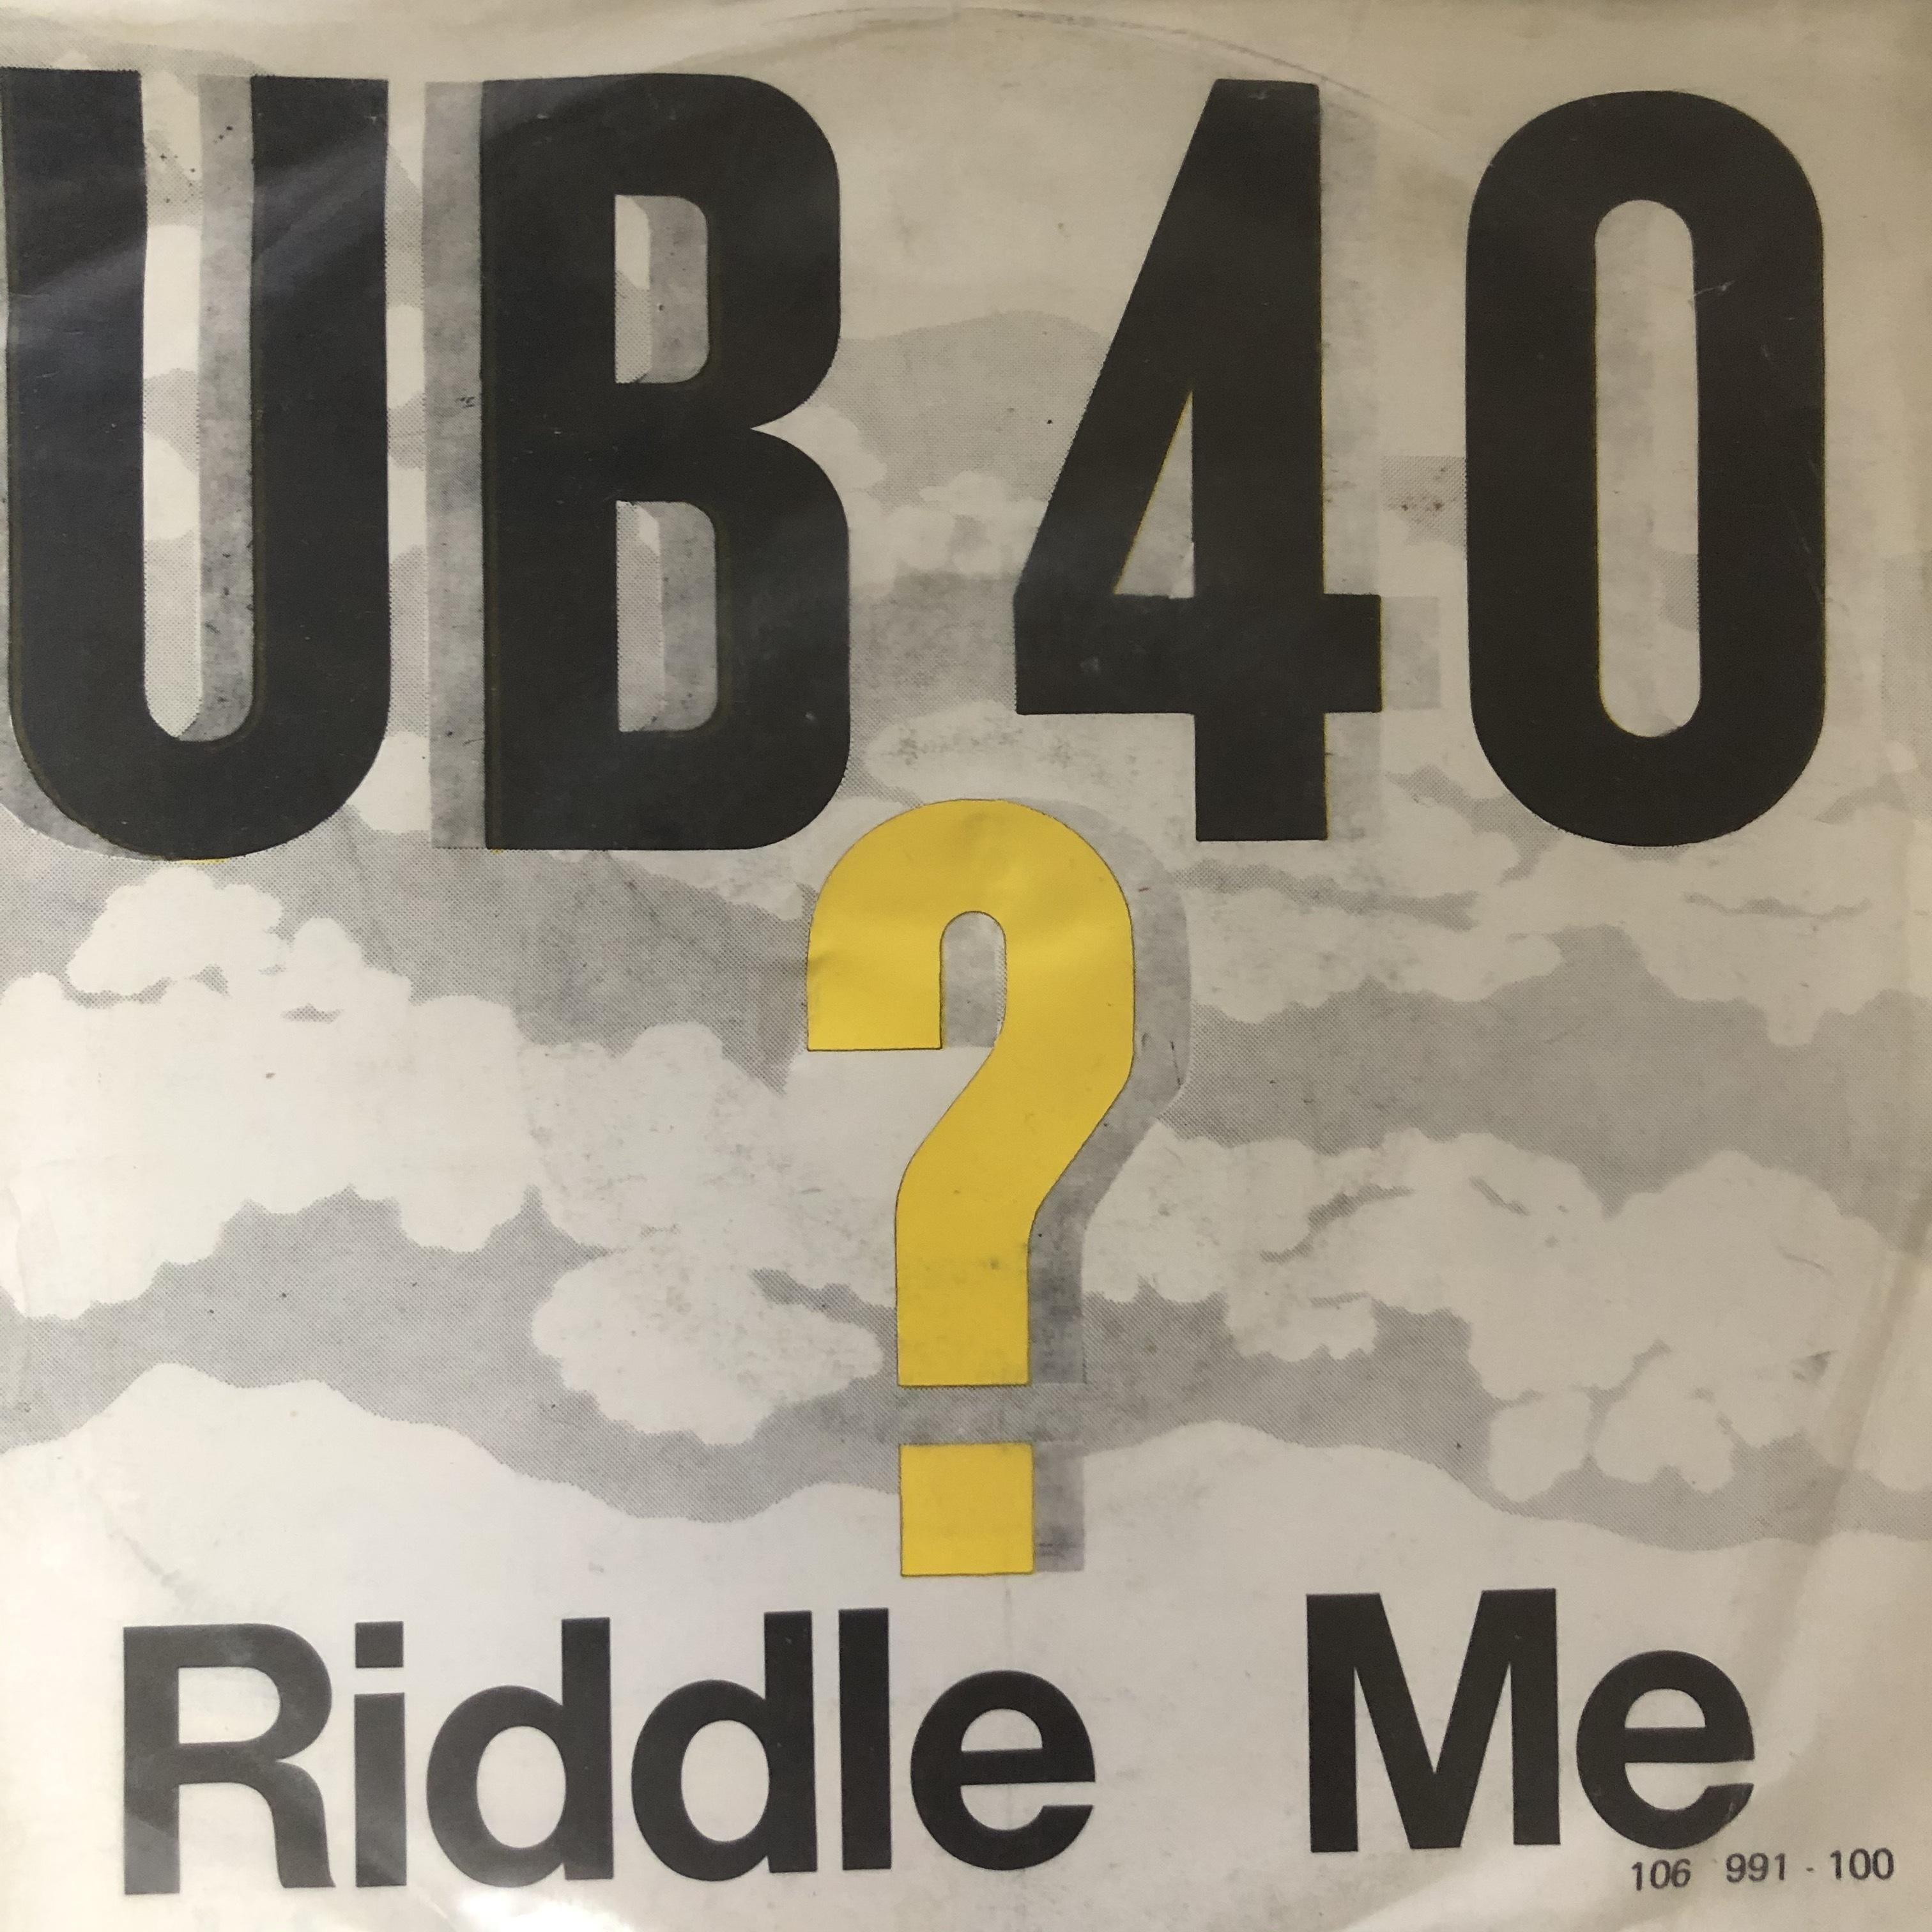 UB40 - Riddle Me【7-20542】